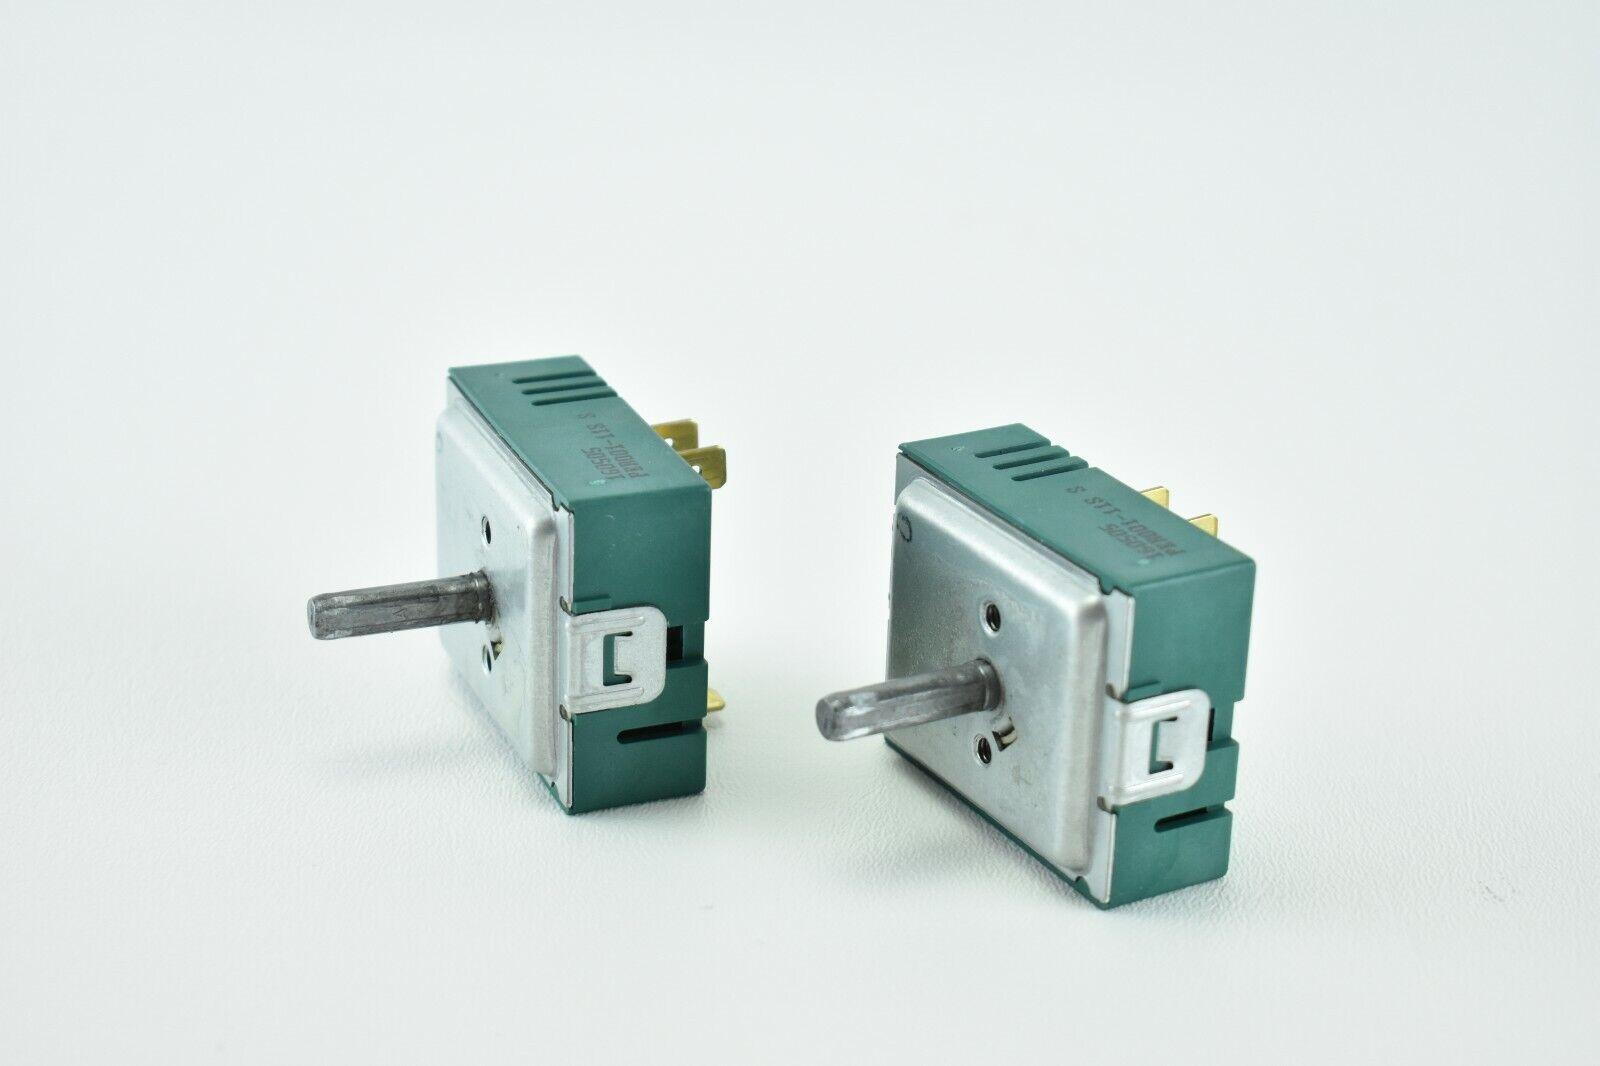 PER001-11S LG Range Surface Element Control Switch EBF62174903